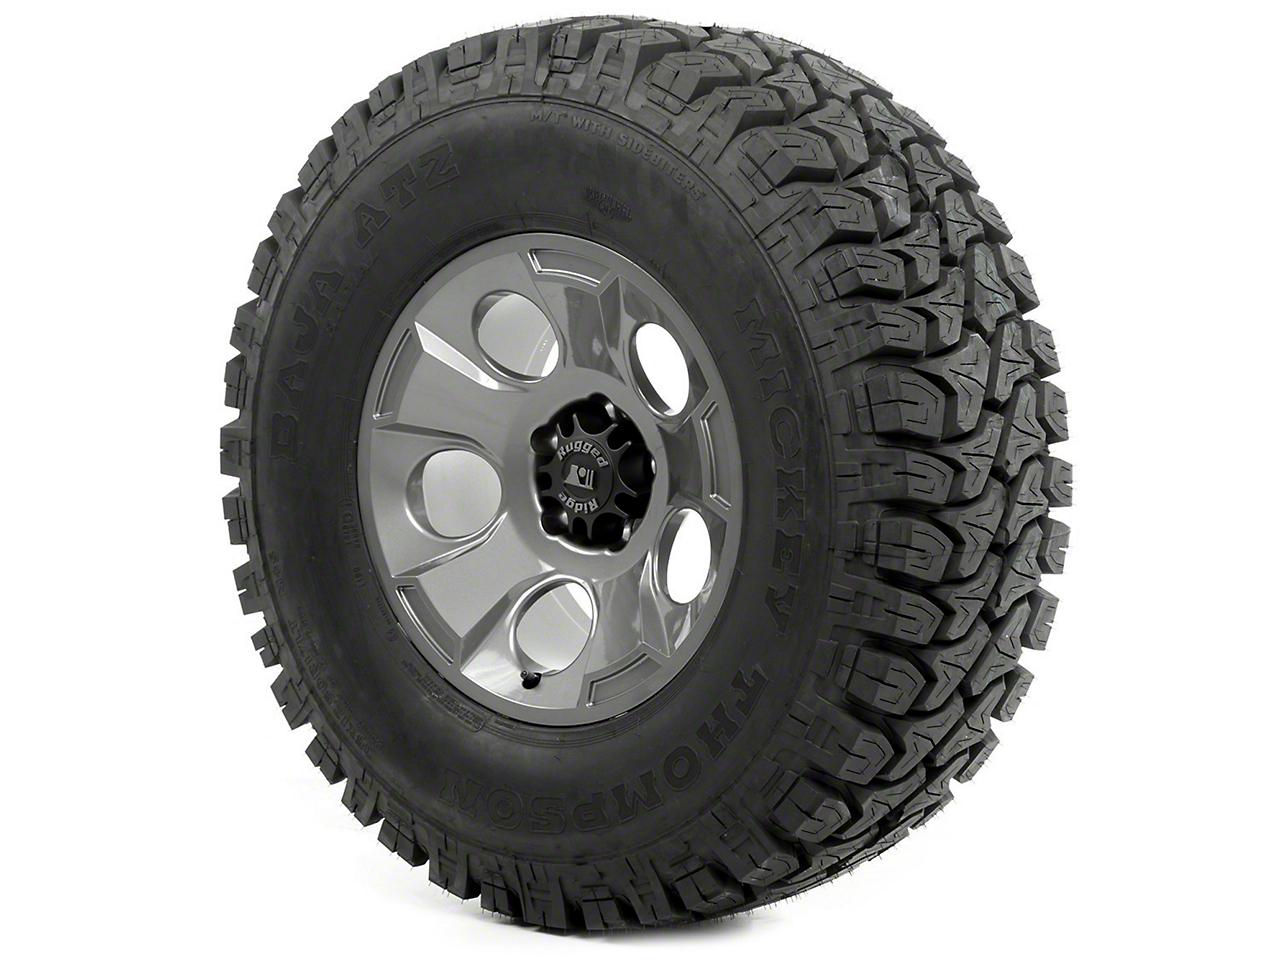 Rugged Ridge Drakon Wheel 17x9 Gun Metal and Mickey Thompson ATZ P3 35x12.50x17 Tire (13-18 Wrangler JK)